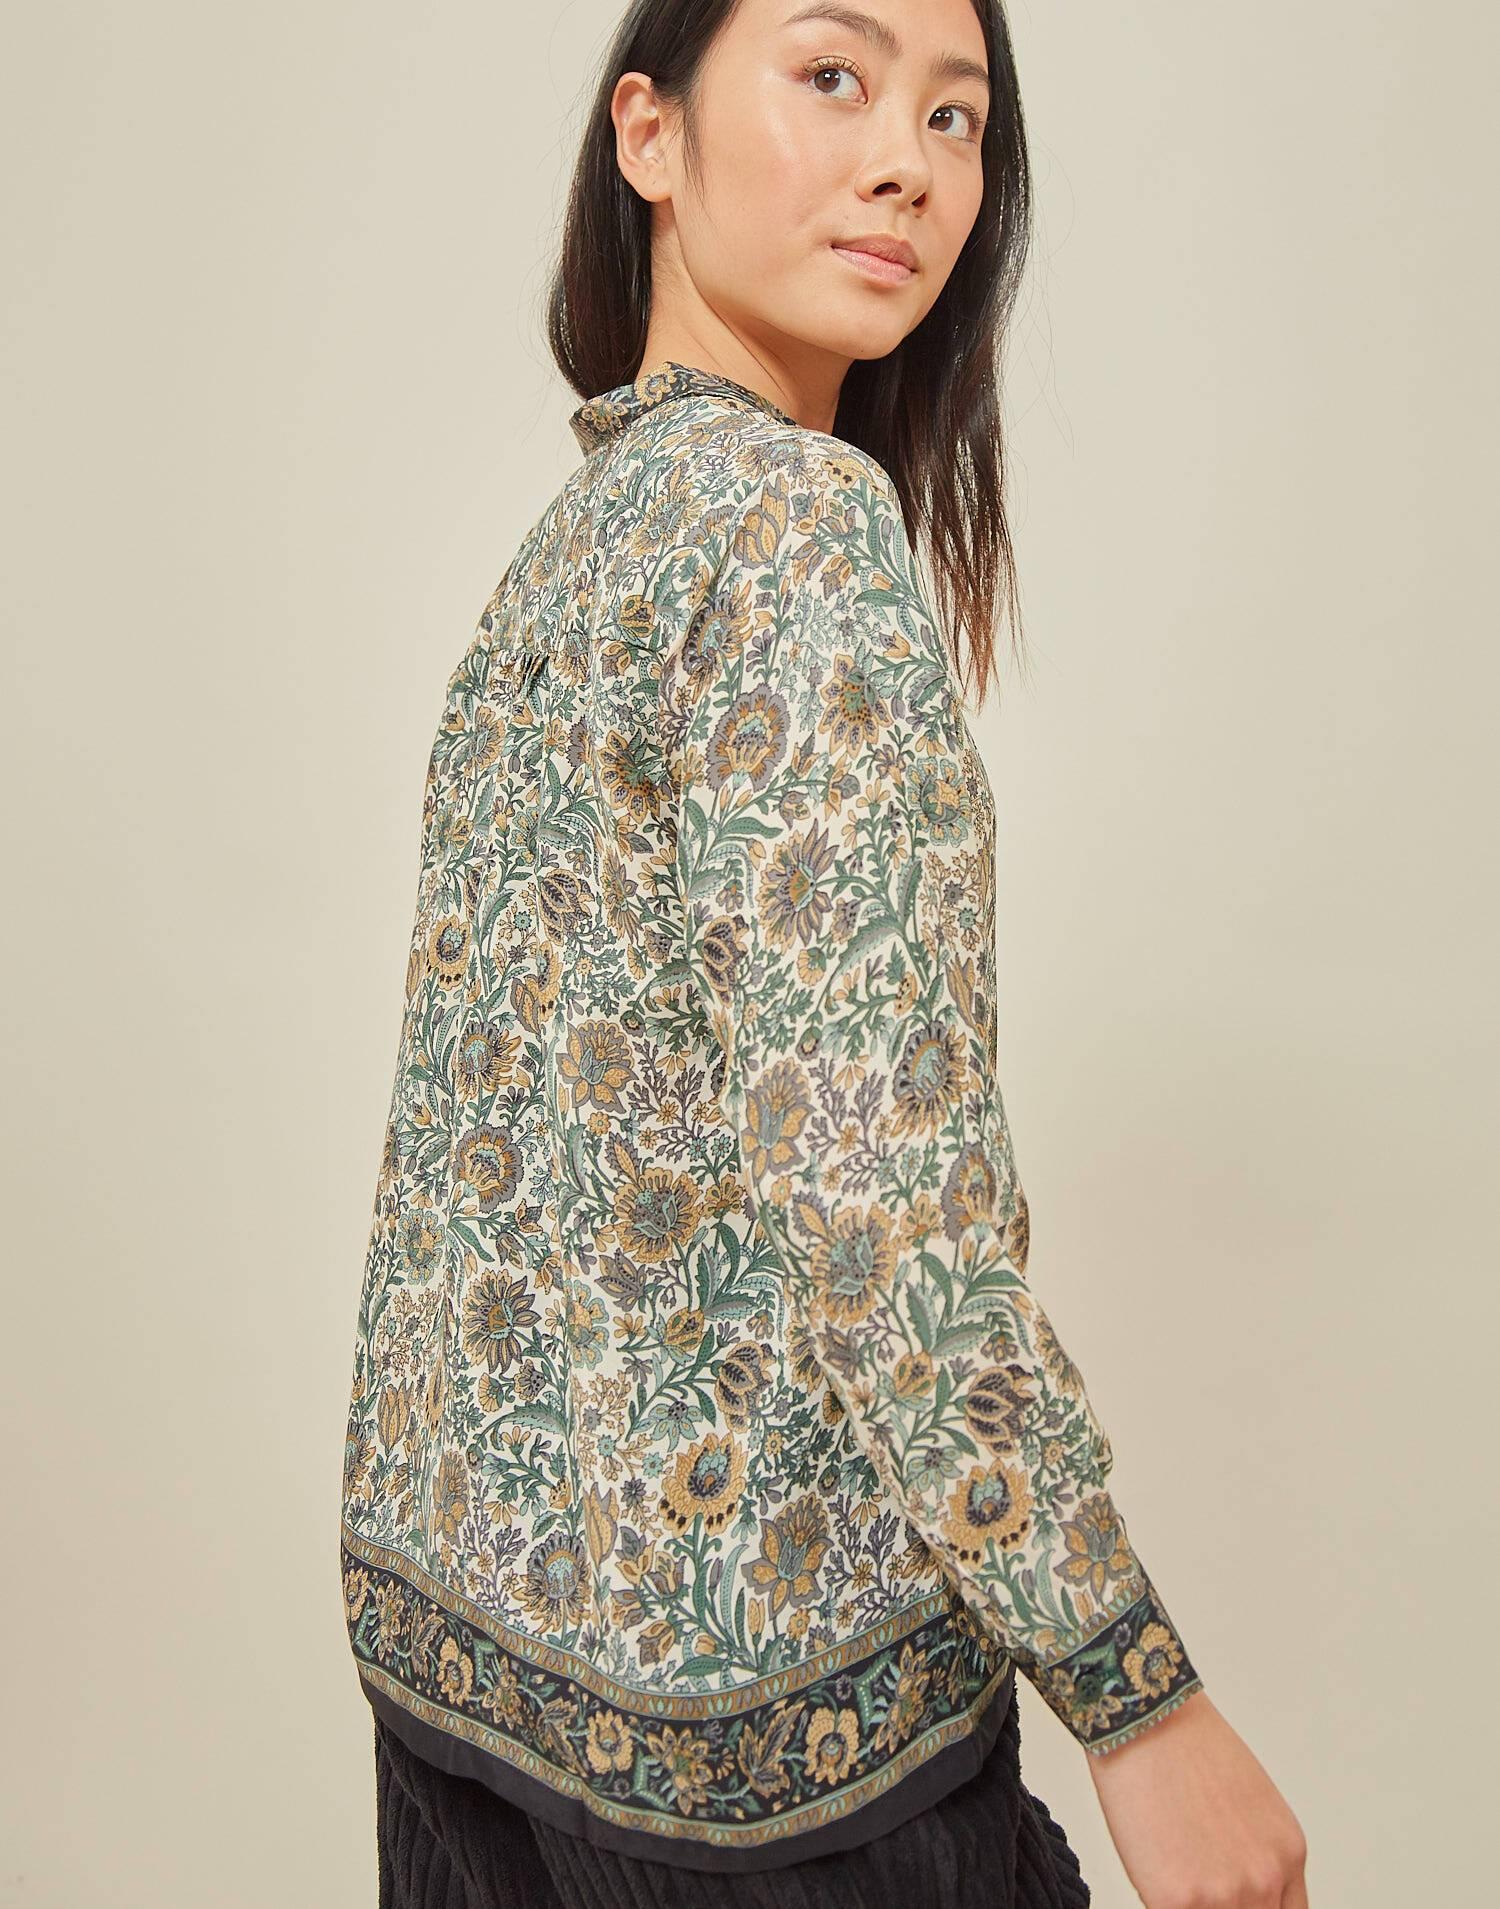 Camisa efecto seda print posicional